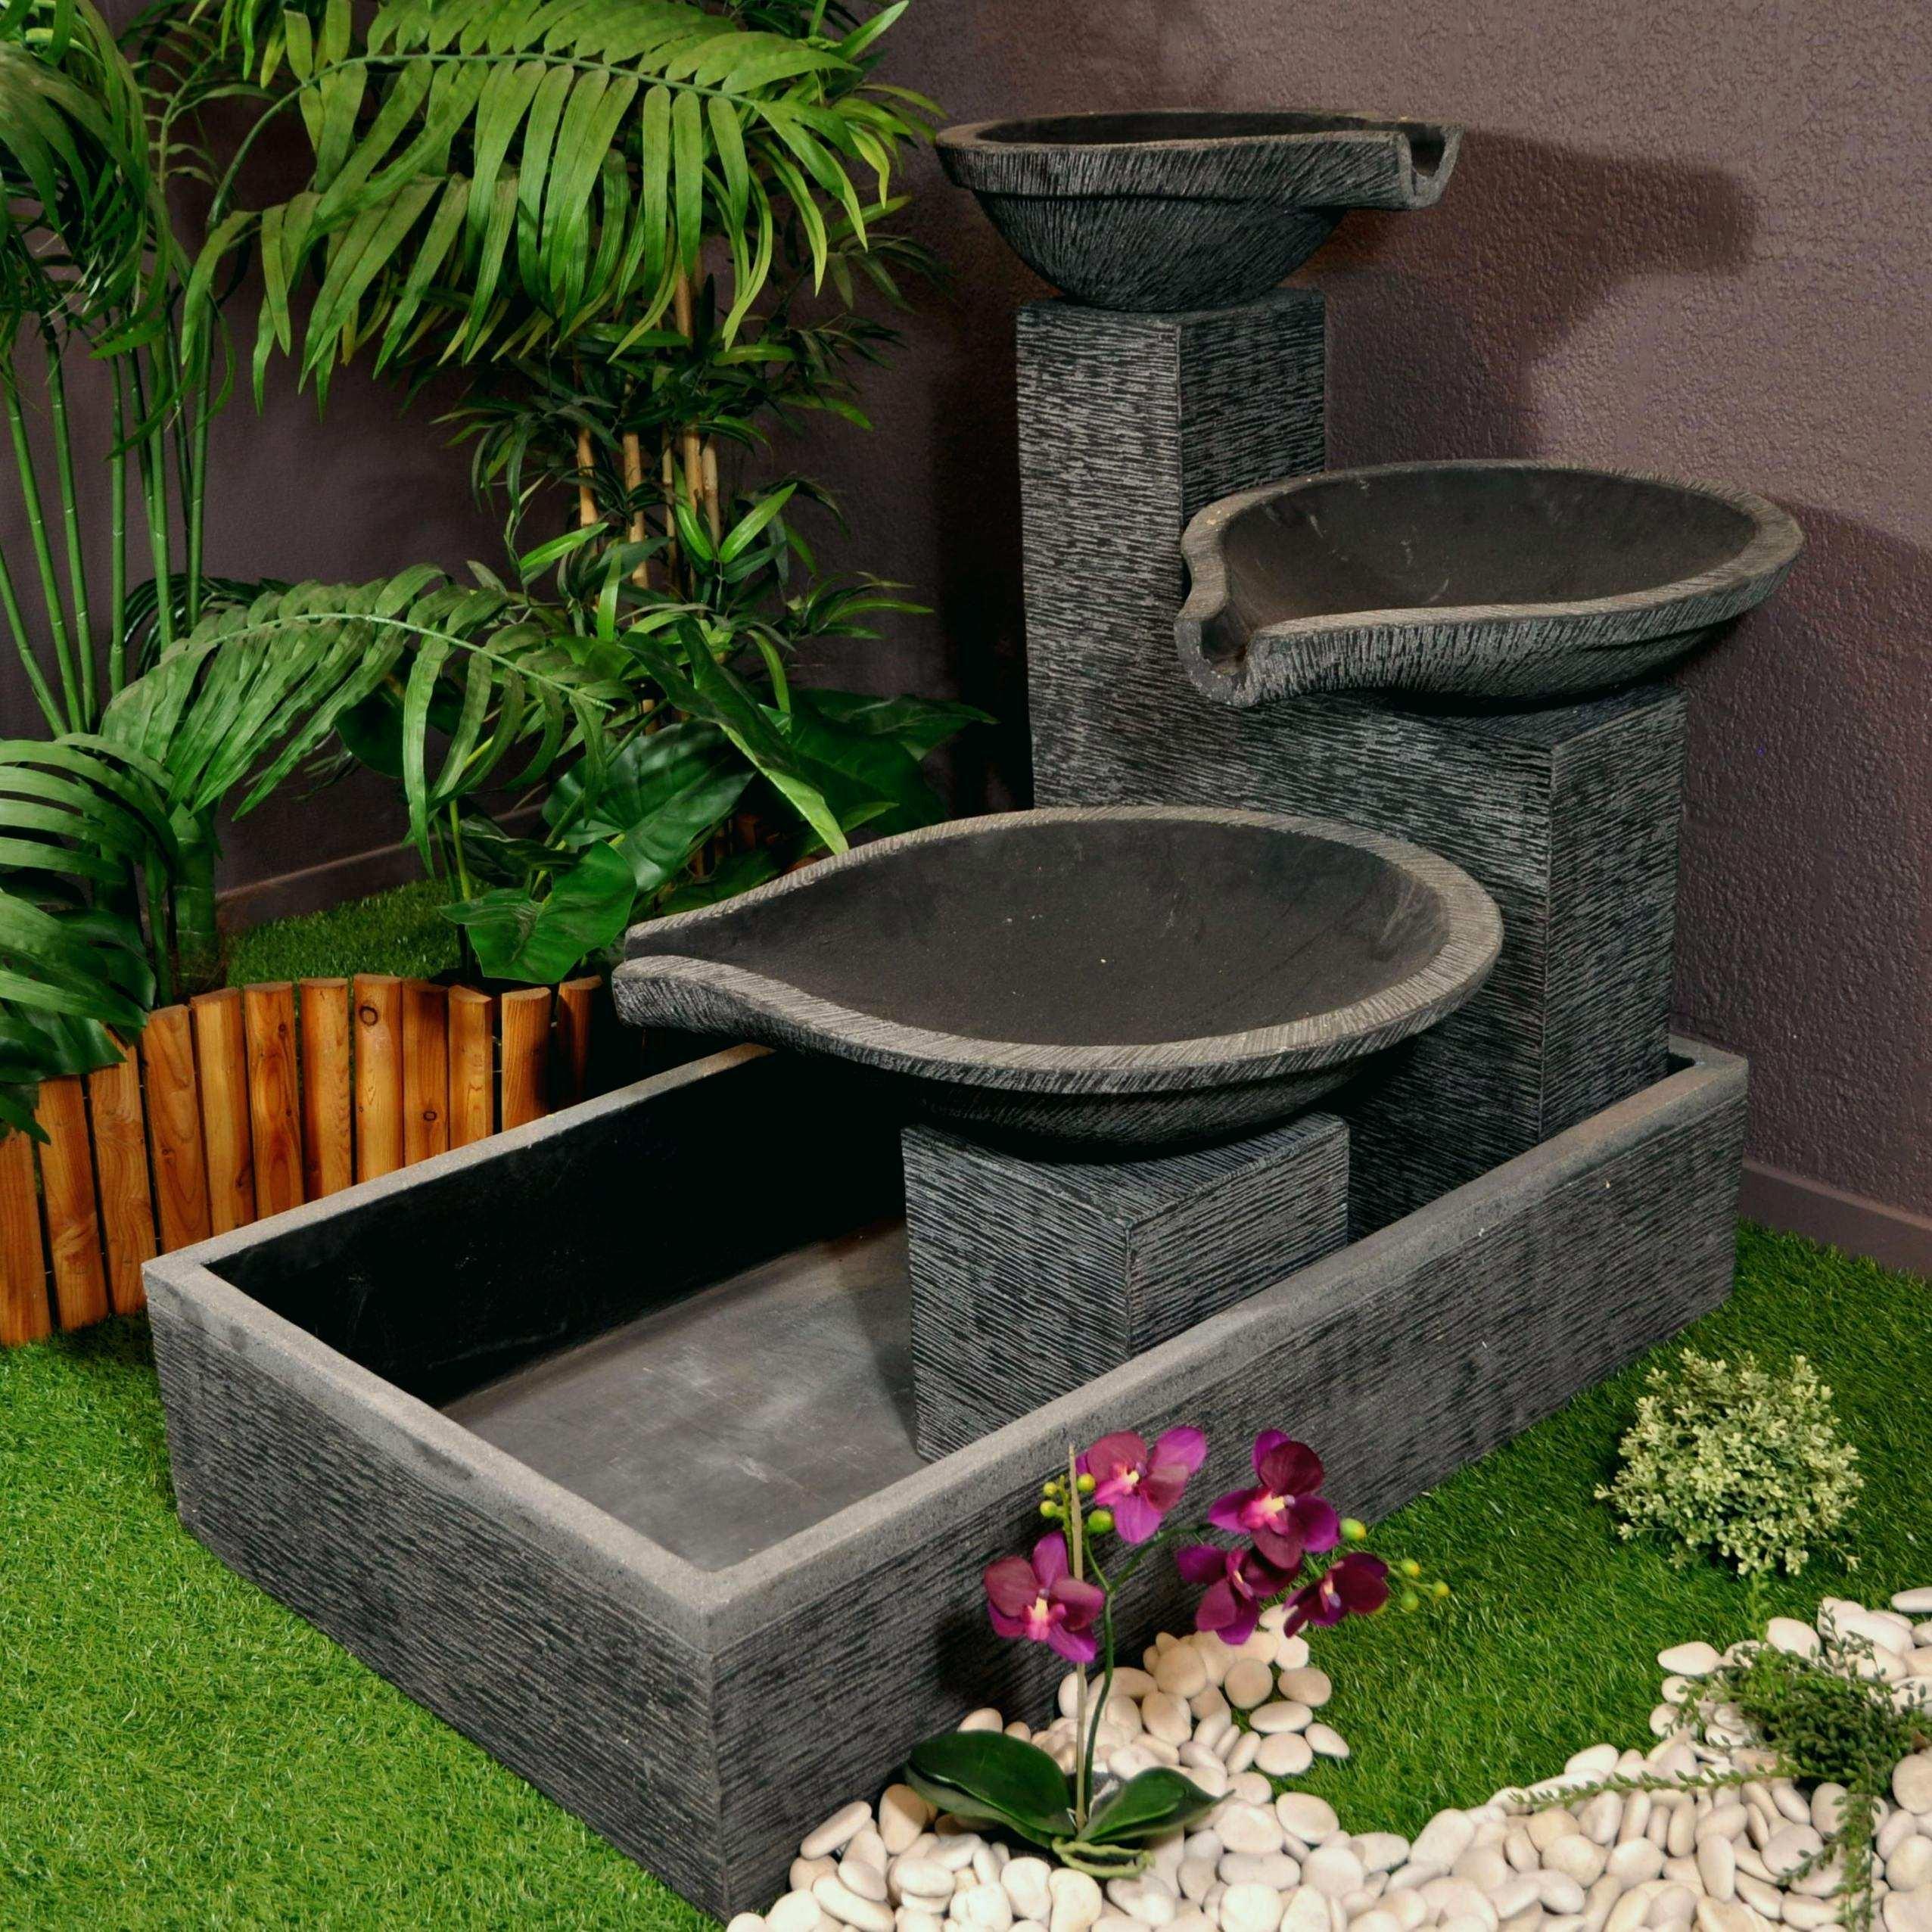 Jardin Zen Miniature Jardiland Élégant Photos Jardin Zen Miniature Jardiland Unique Jardin Zen Miniature Avec